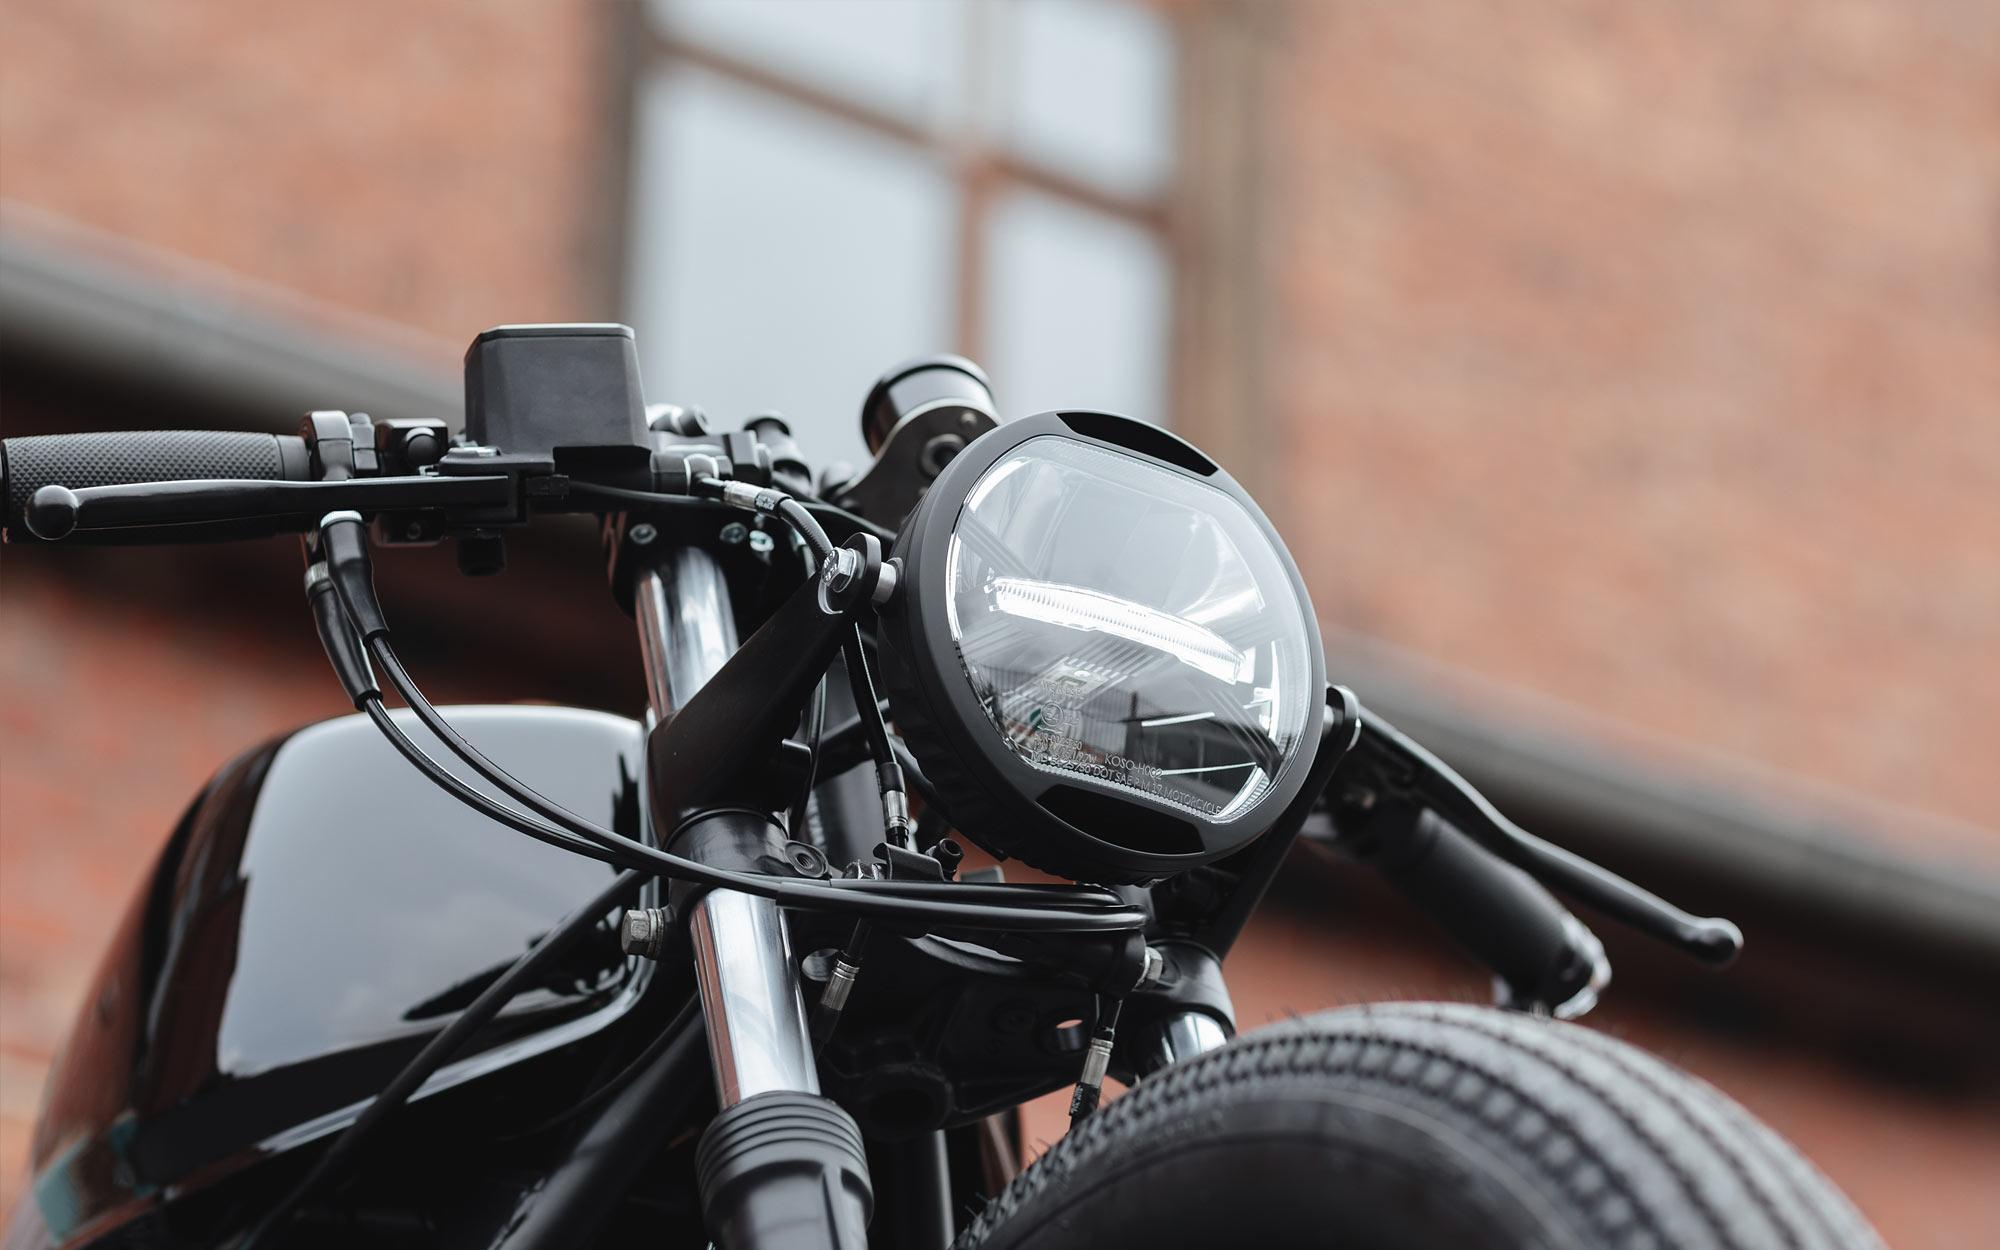 BIRD OF PRAY. Hookie's Evil 'Crow' Honda CB750 Cafe Racer